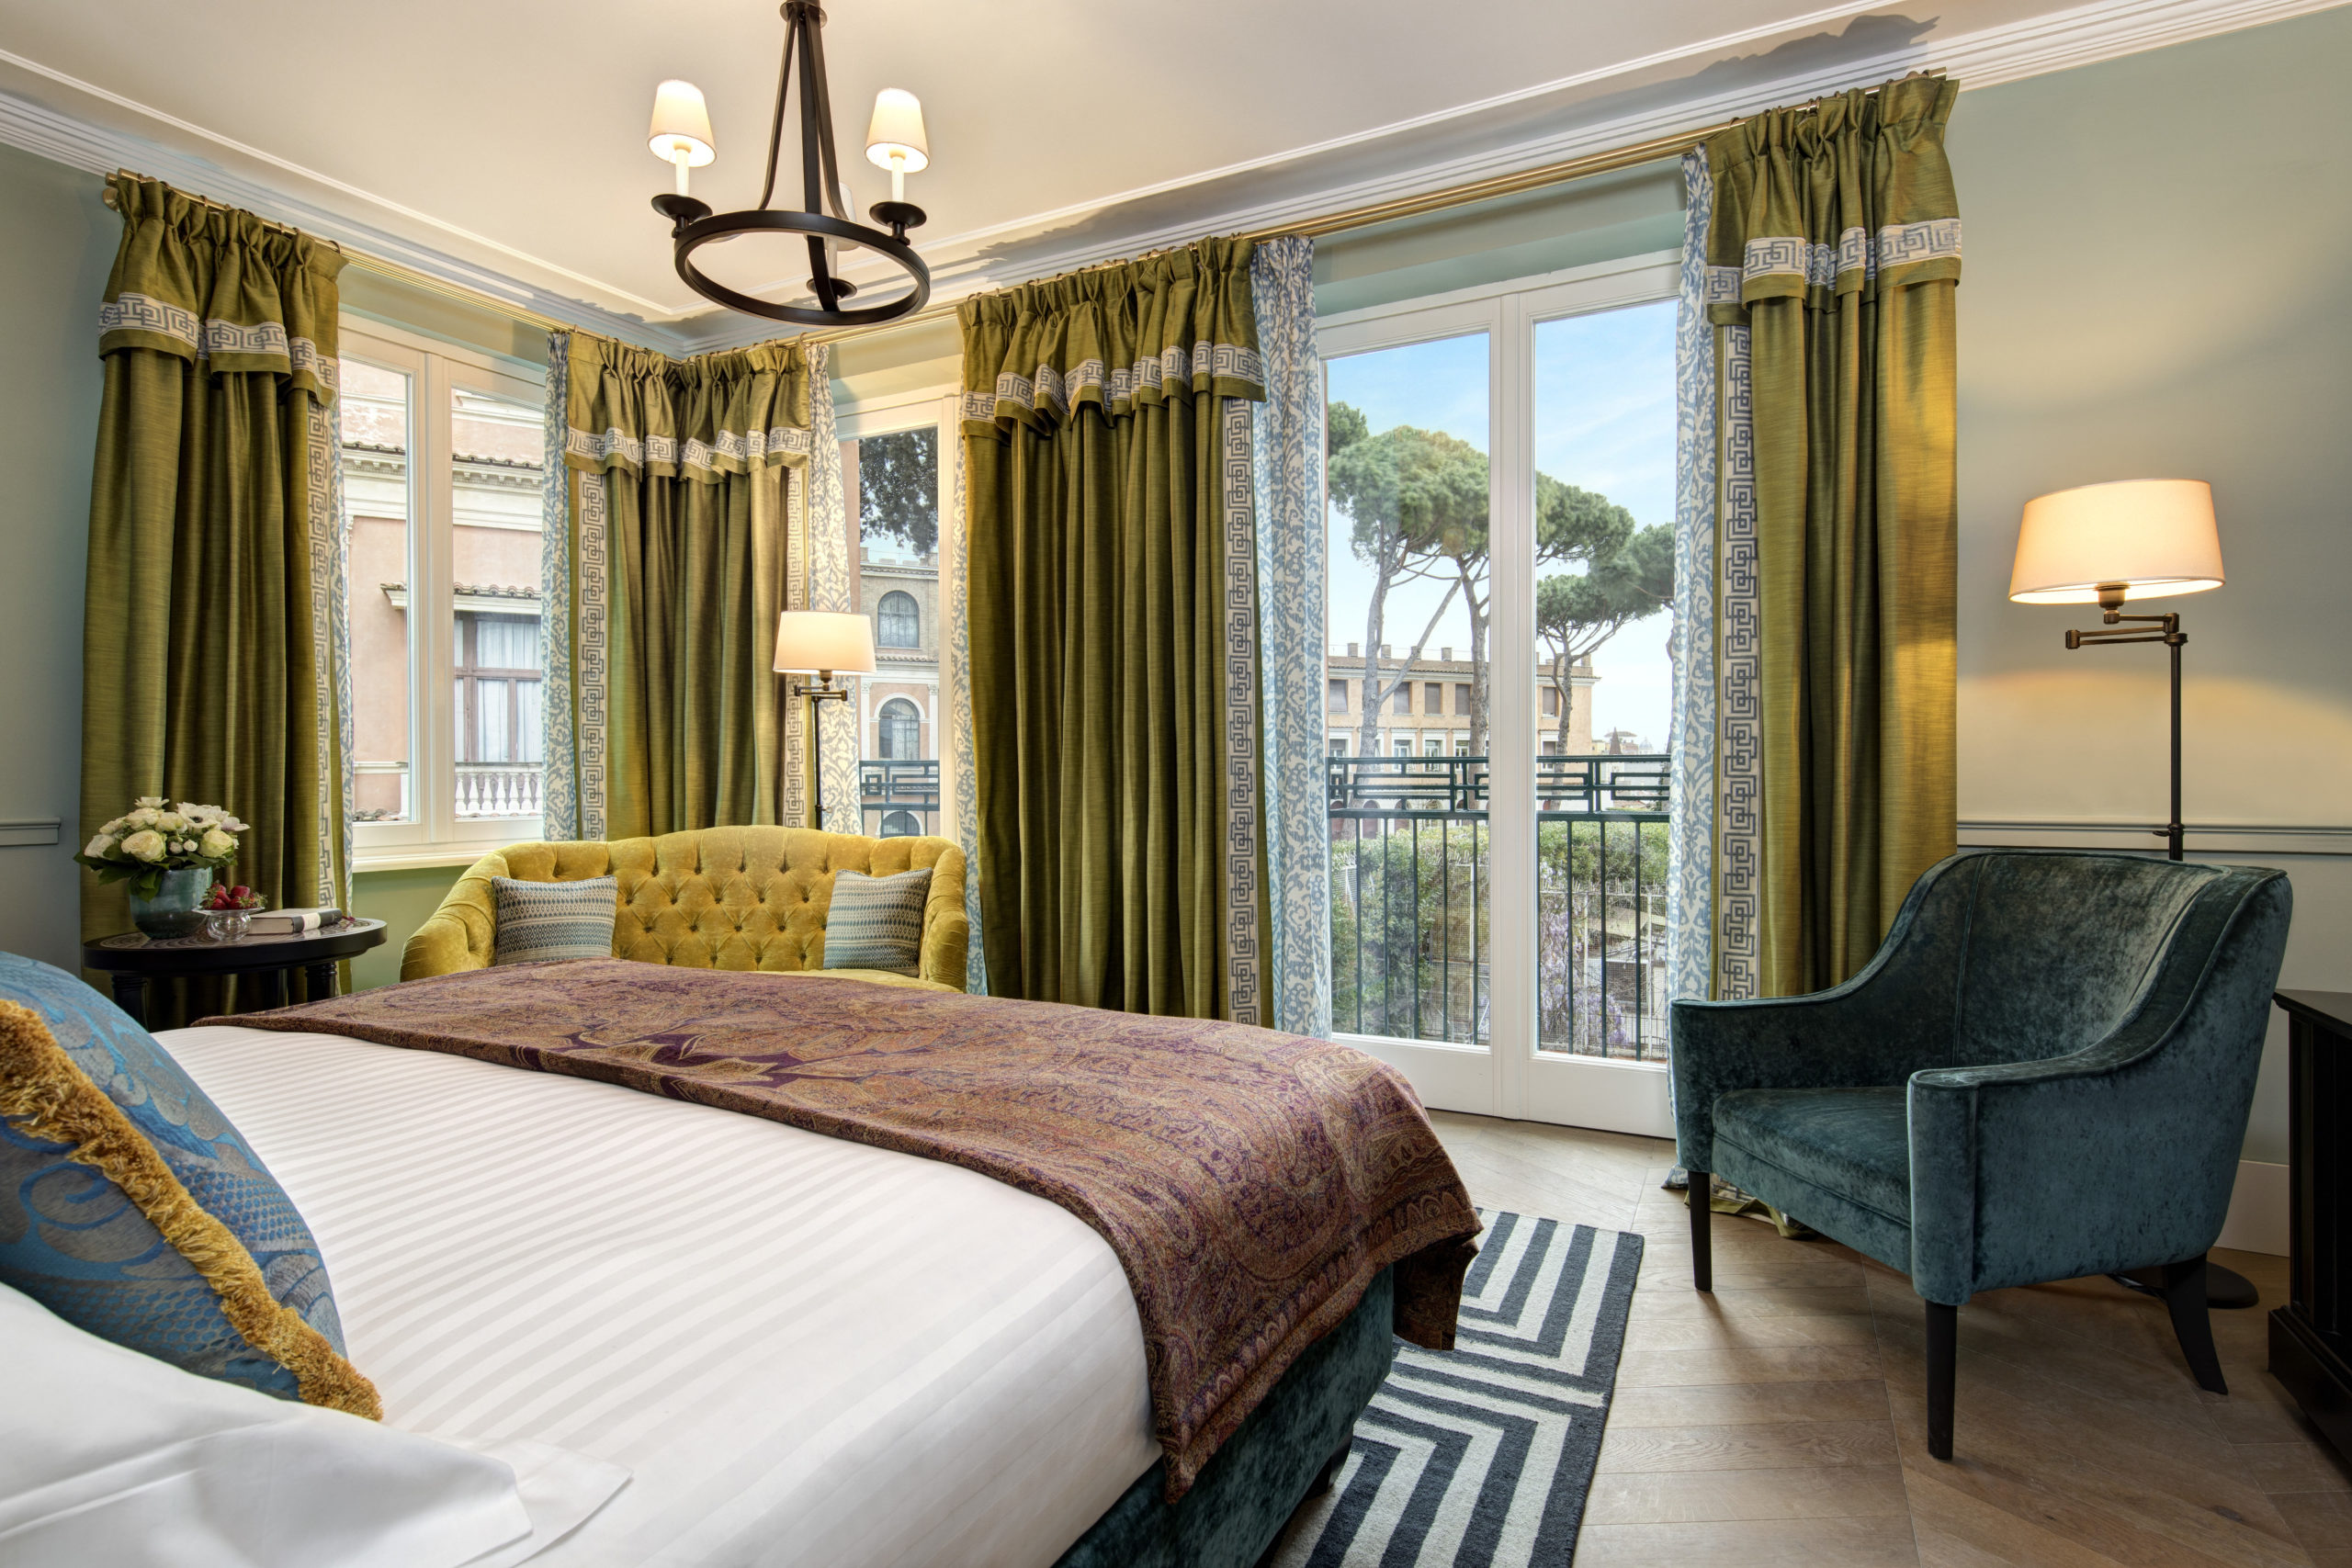 Reise durch Italien Hotel de la Ville